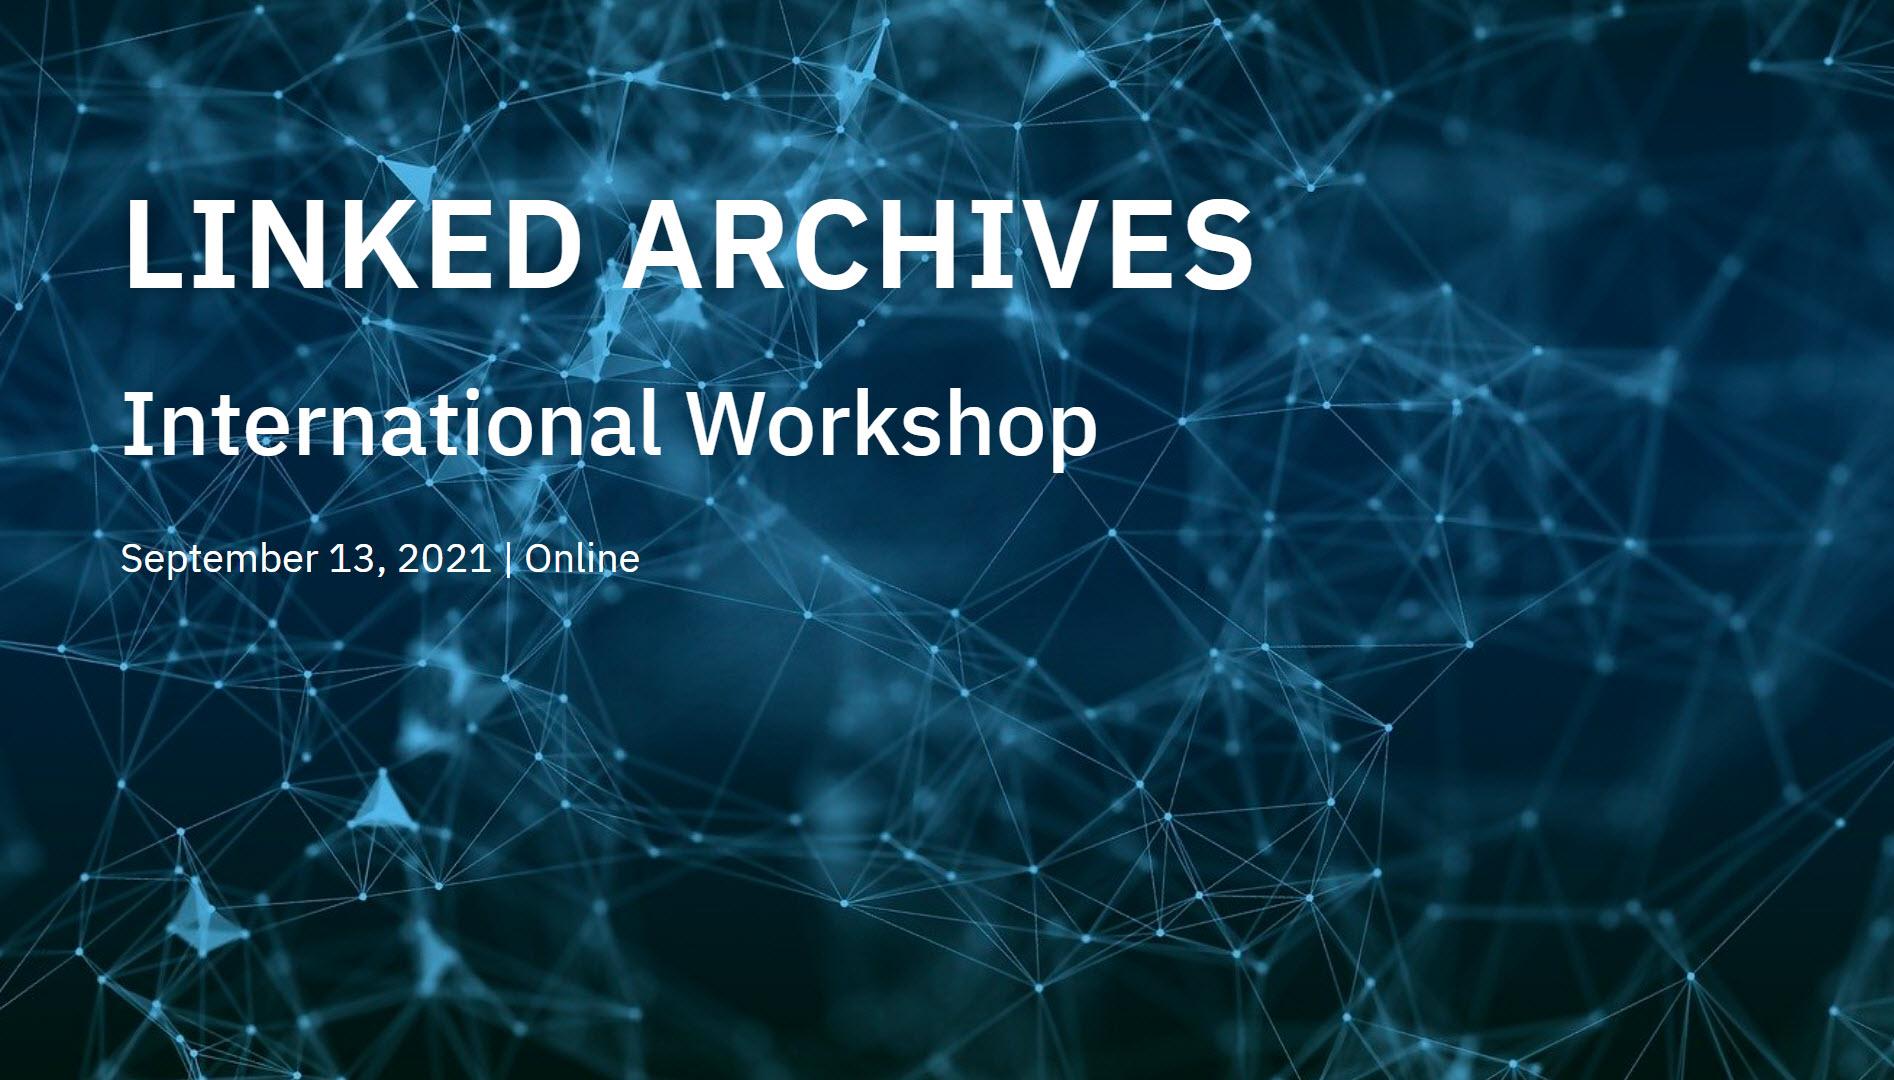 International Workshop on Archives and Linked Data 2021